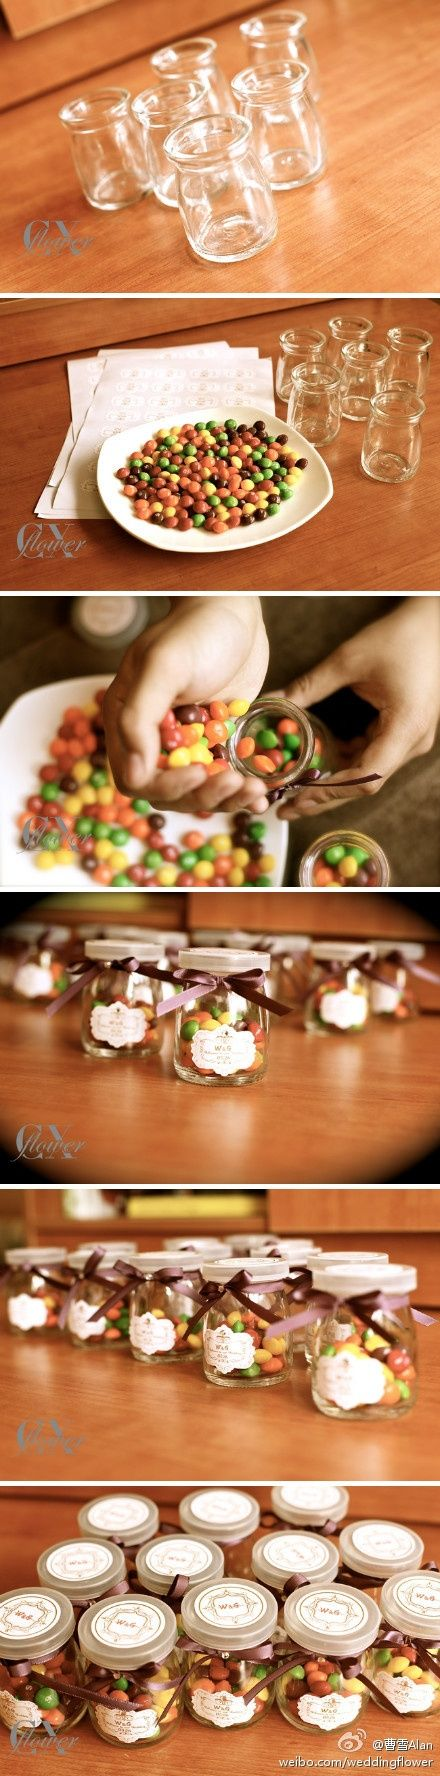 Skittle wedding favours